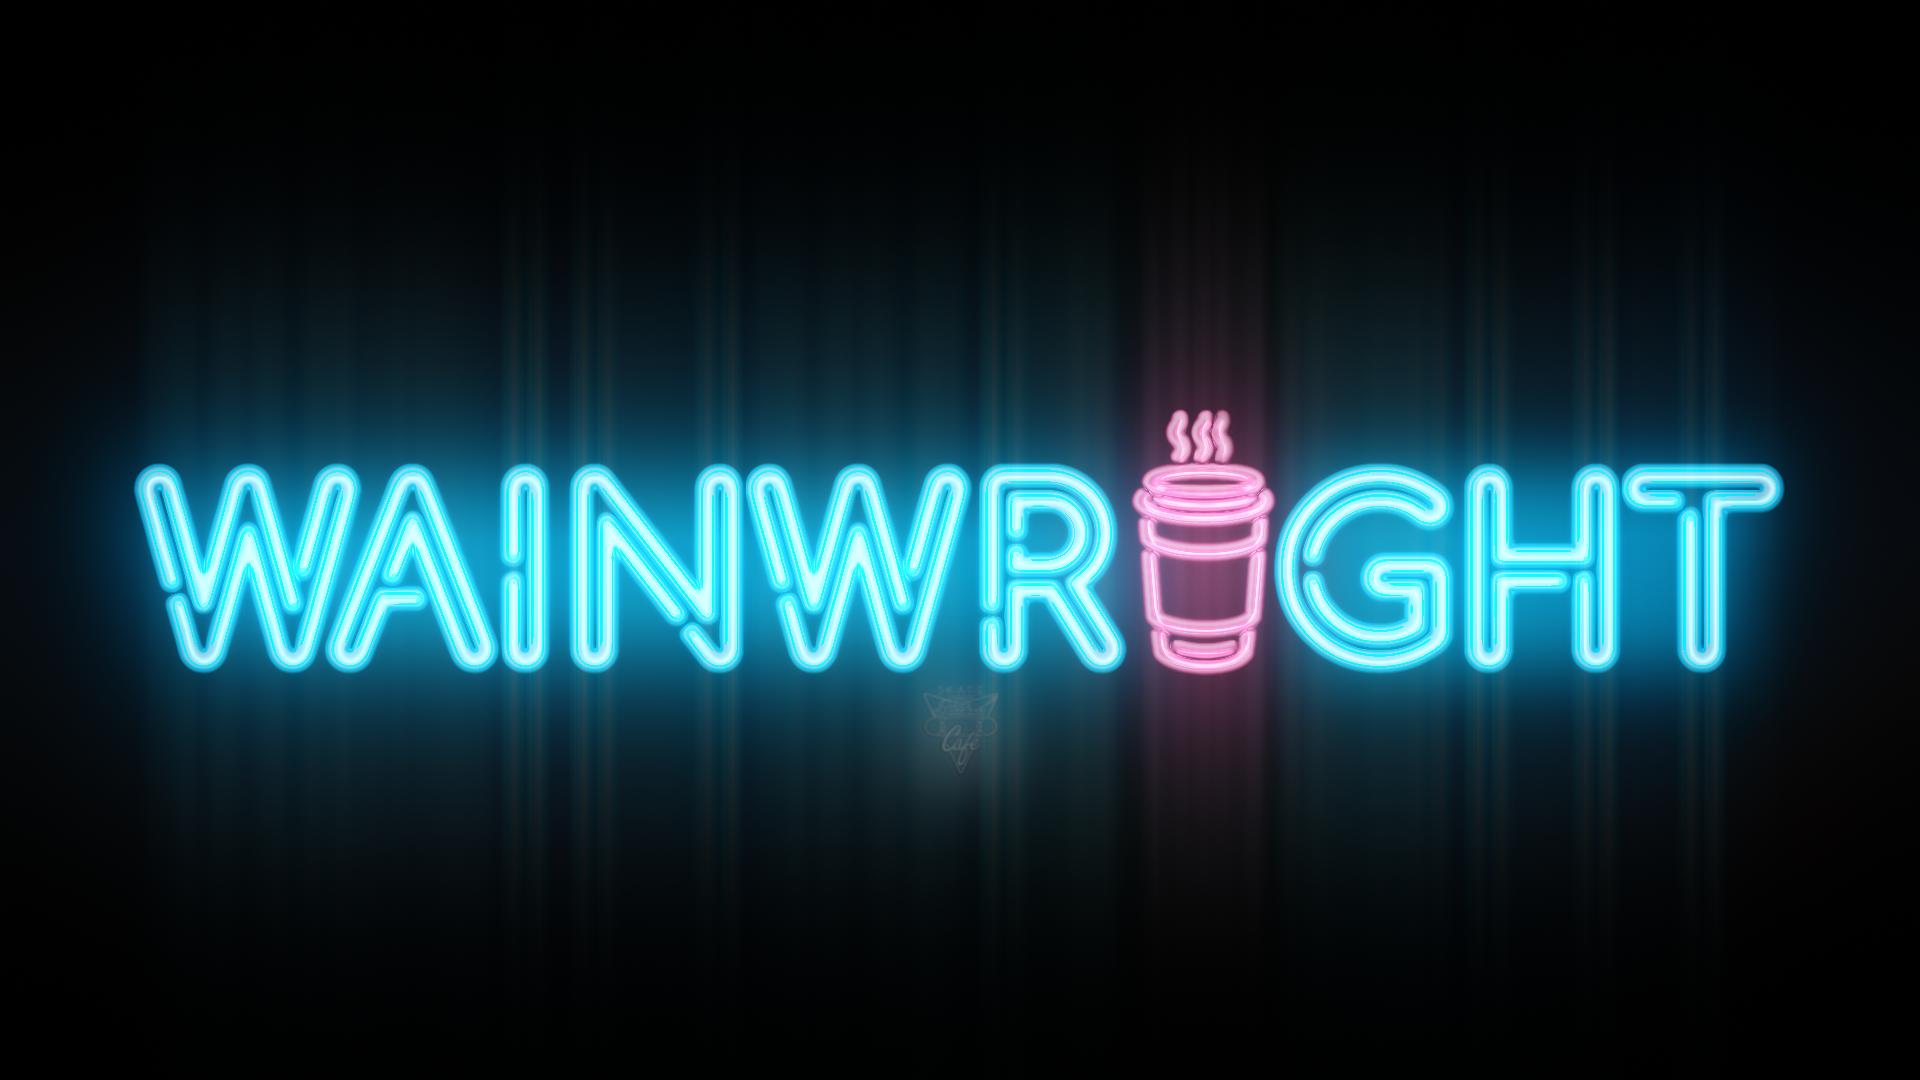 2015-06-Skate-Cafe-Wainwright-neon-glow-main-00096